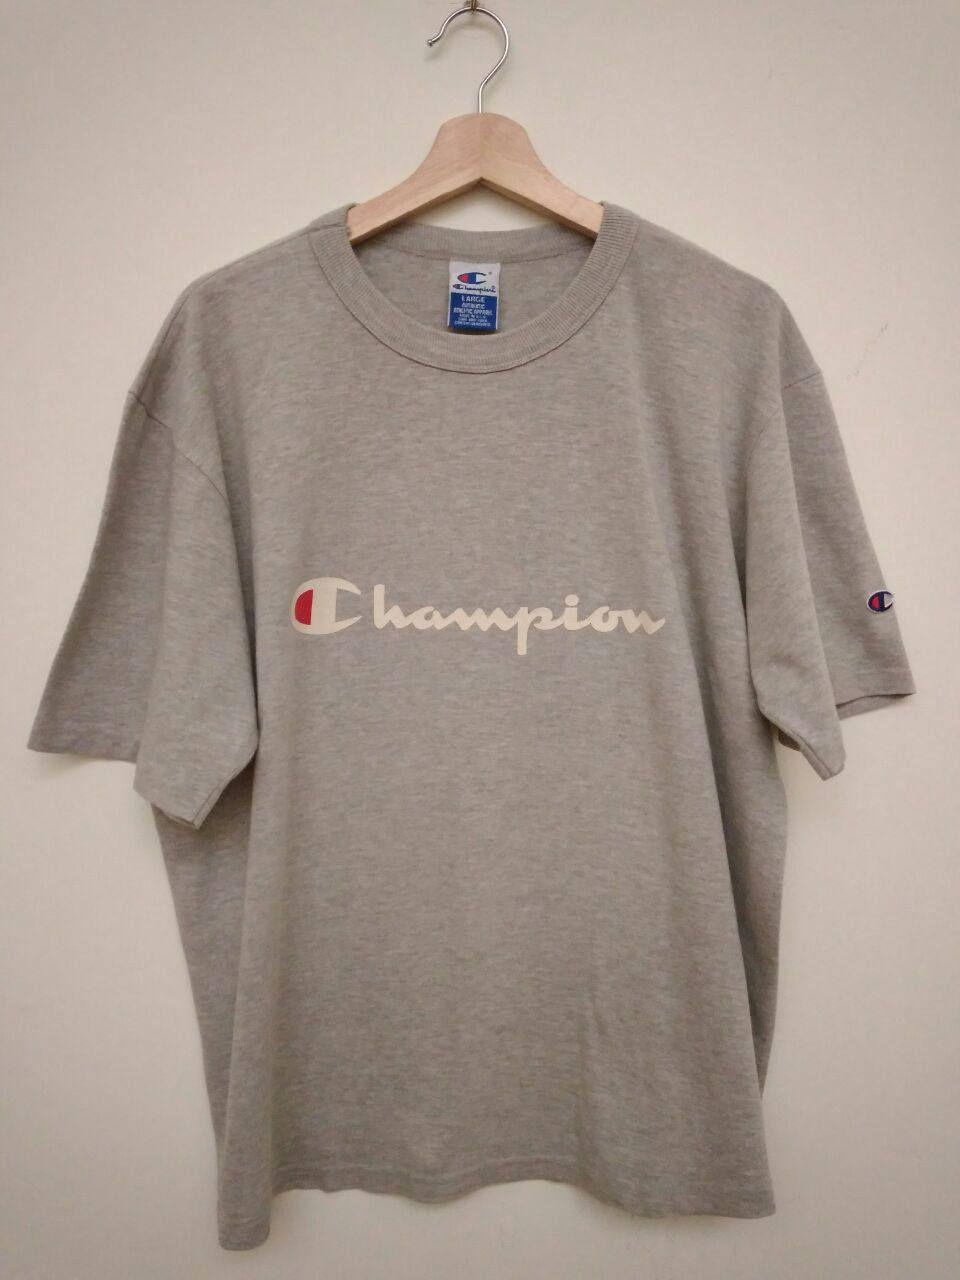 fc380287b Vintage 80s 90s Champion Logo Grey T-Shirt Size L | Sweatshirt ...